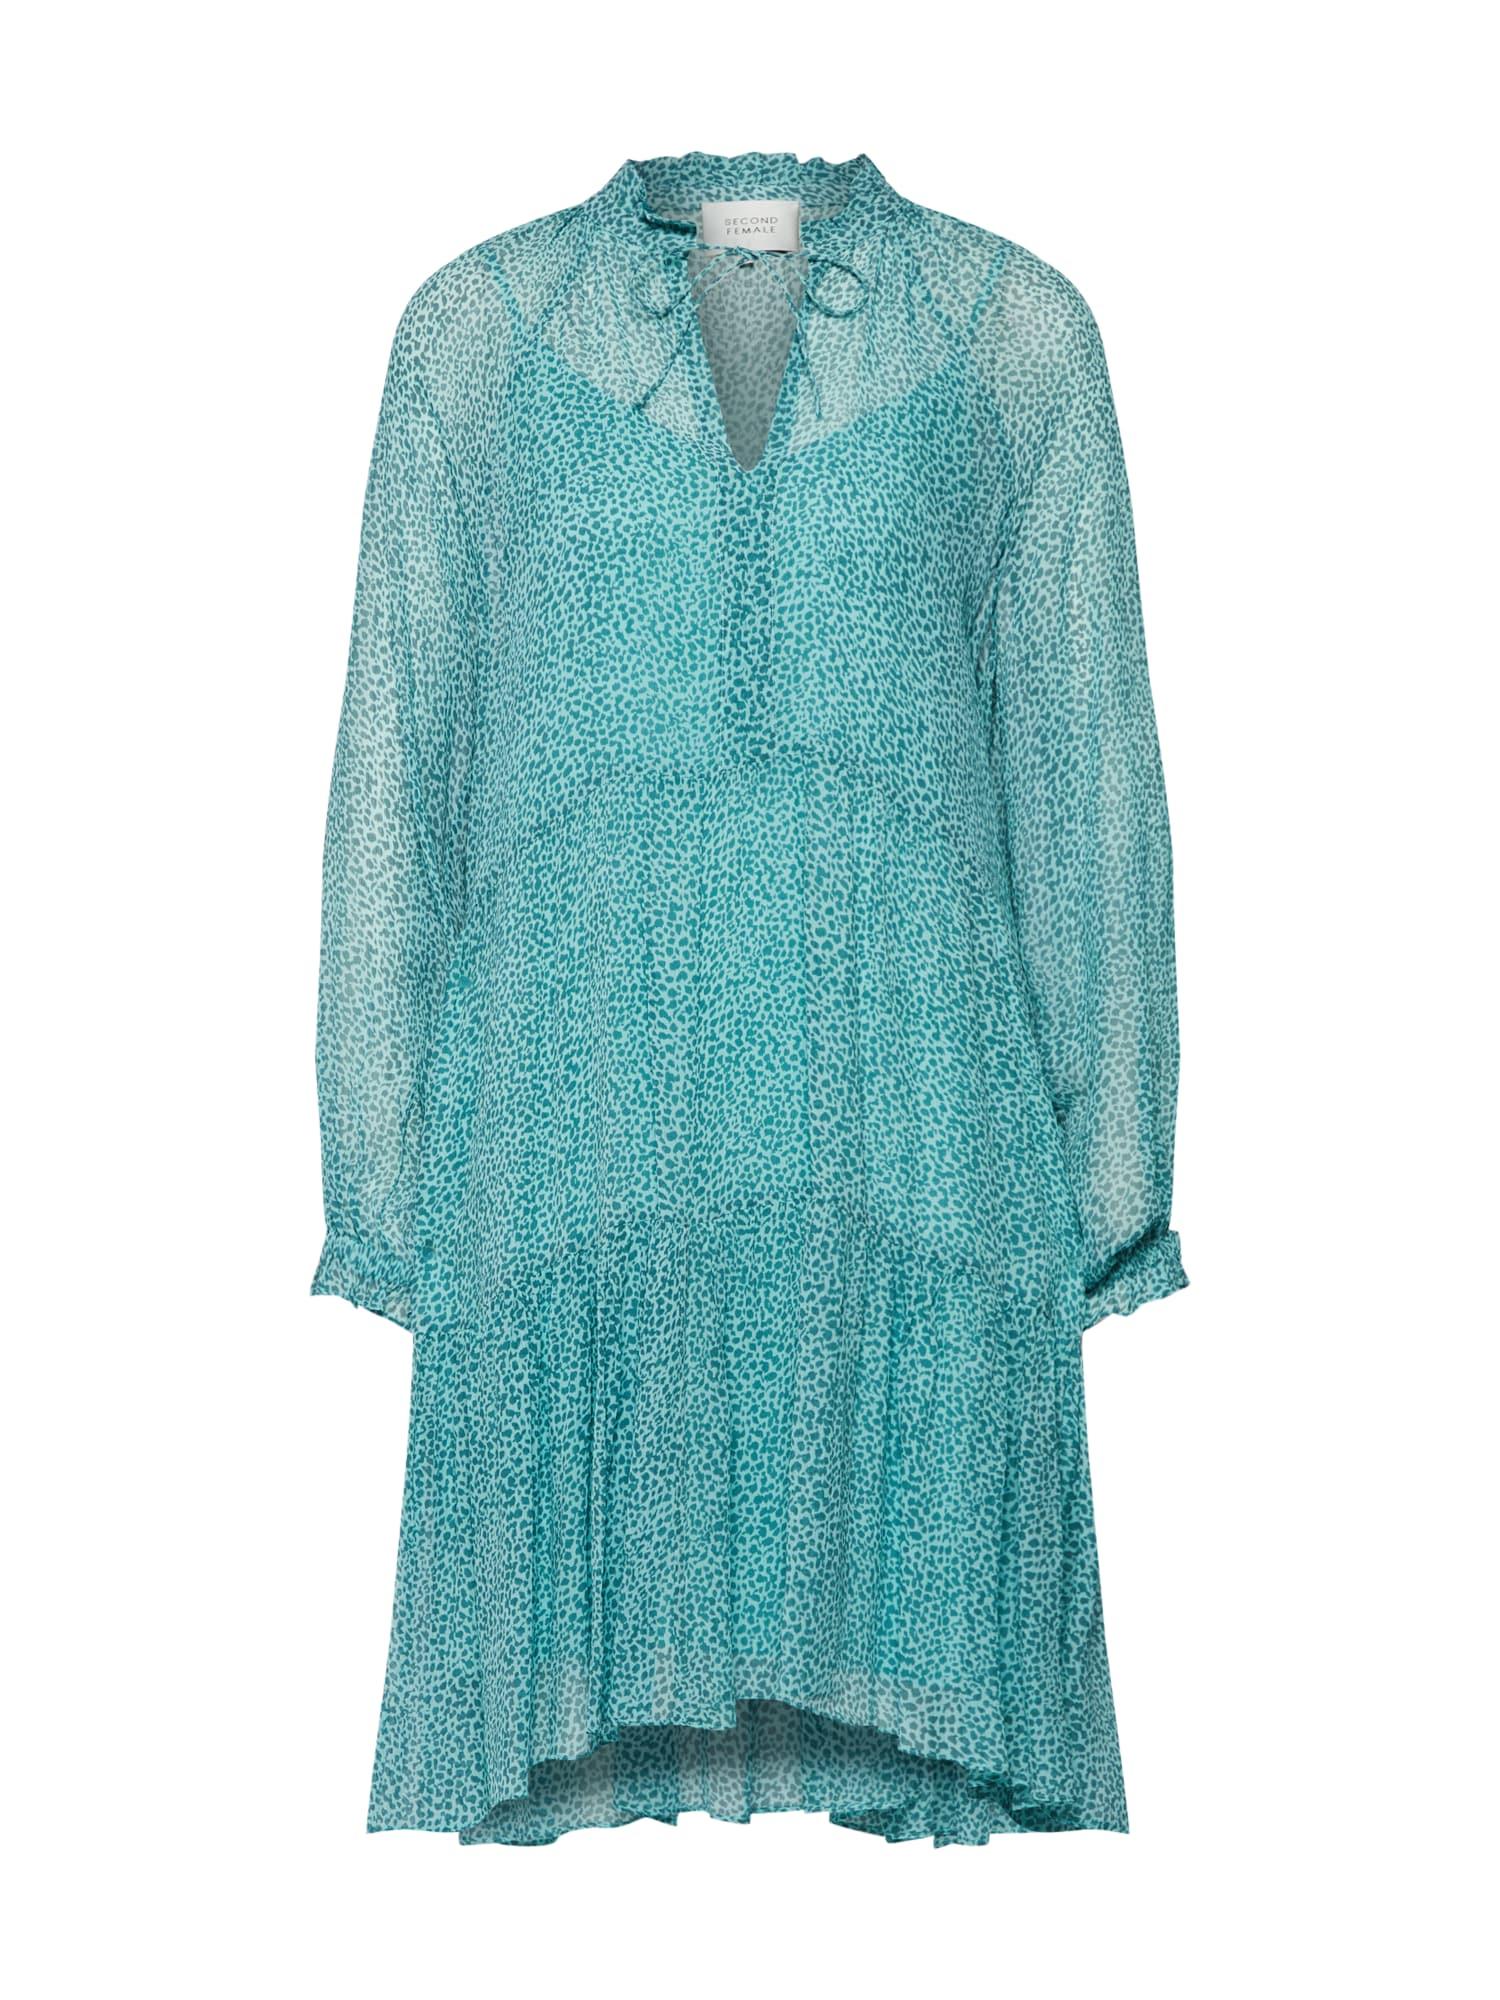 Šaty Lykke modrá SECOND FEMALE